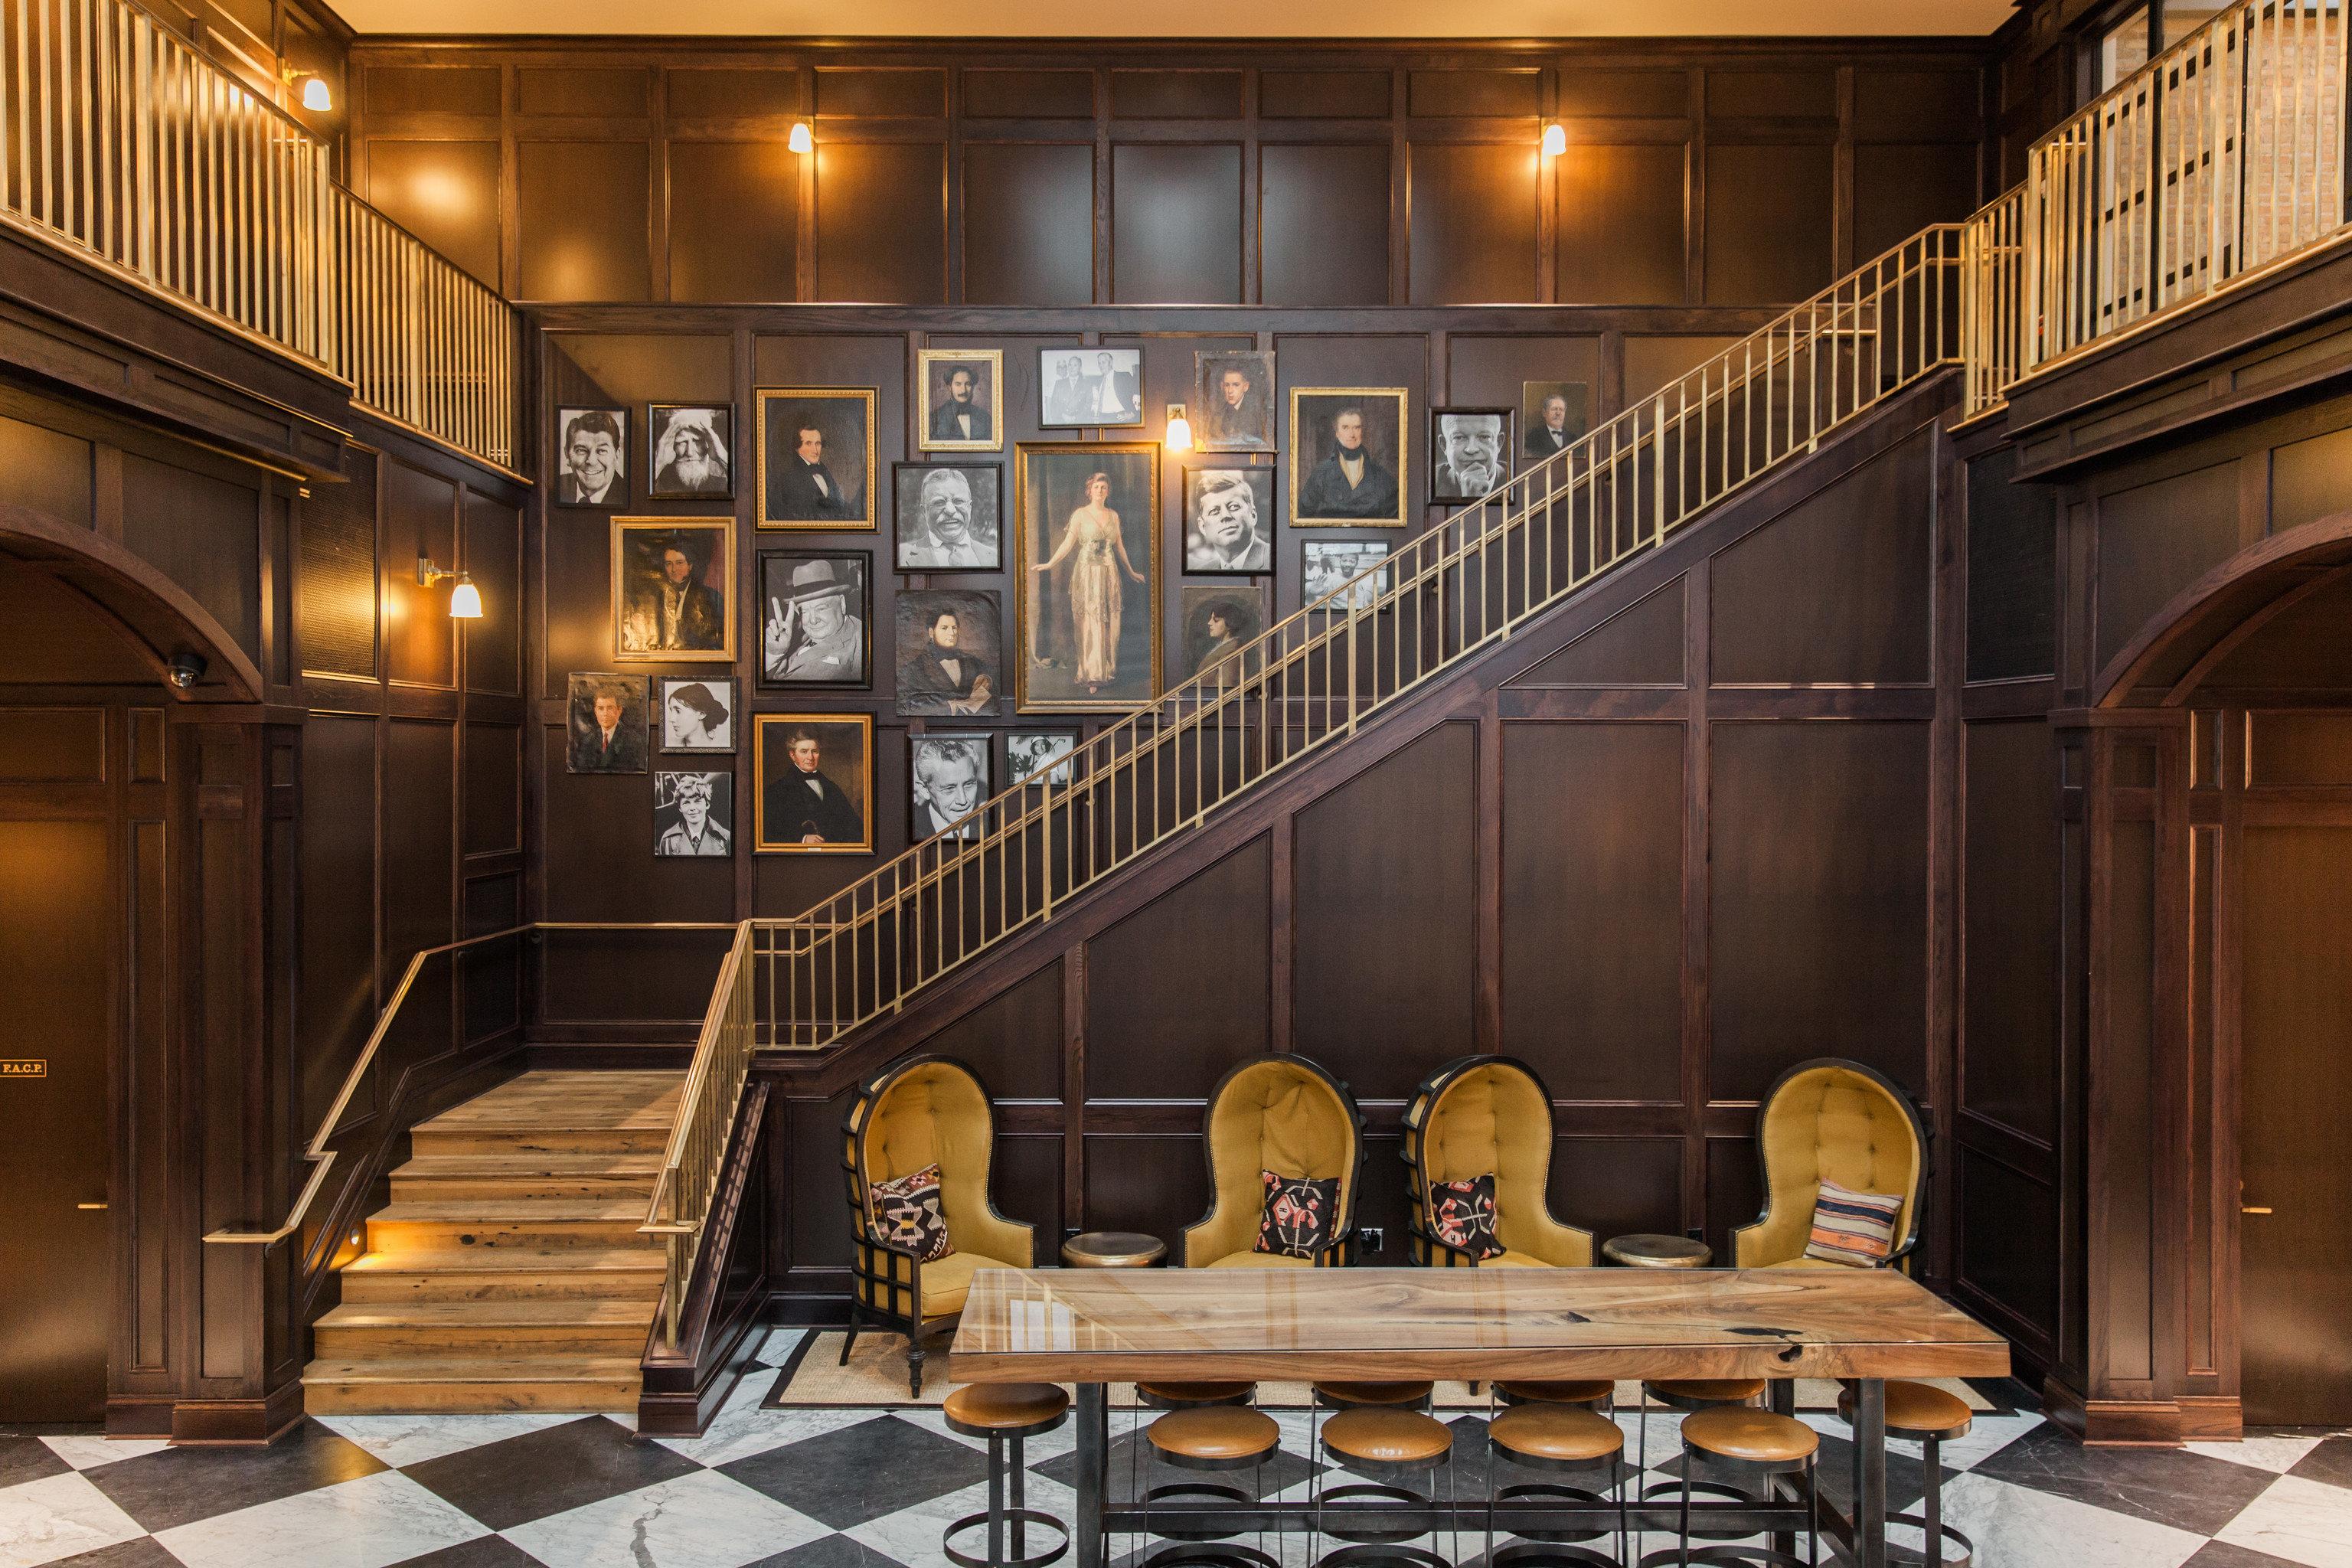 Trip Ideas indoor property room Lobby interior design estate home mansion living room Bar